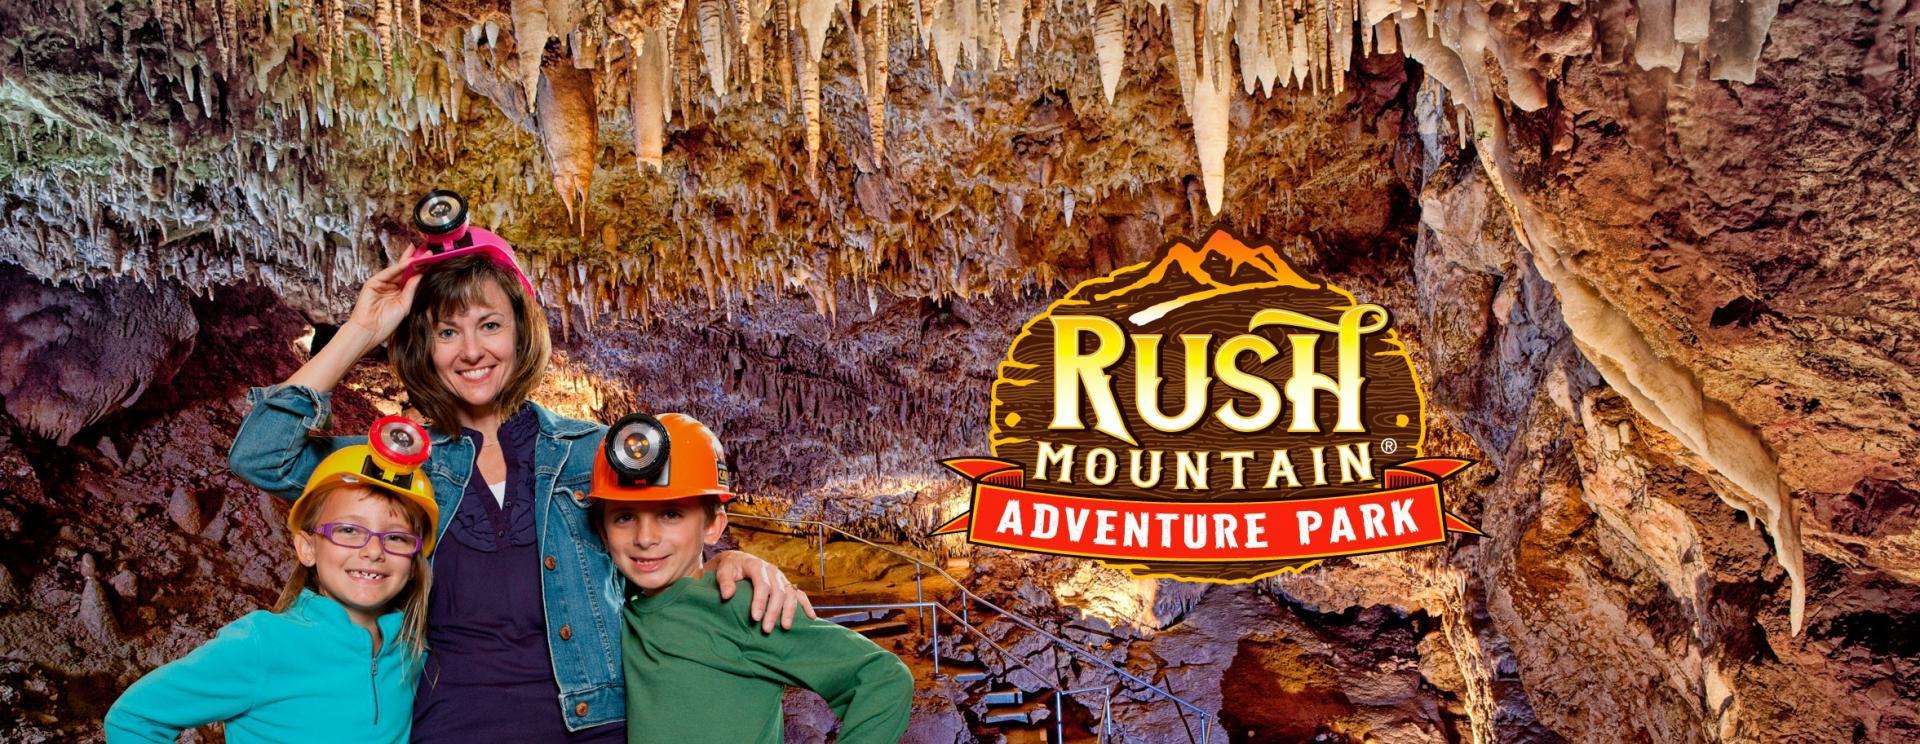 Rush Mountain Adventure Park